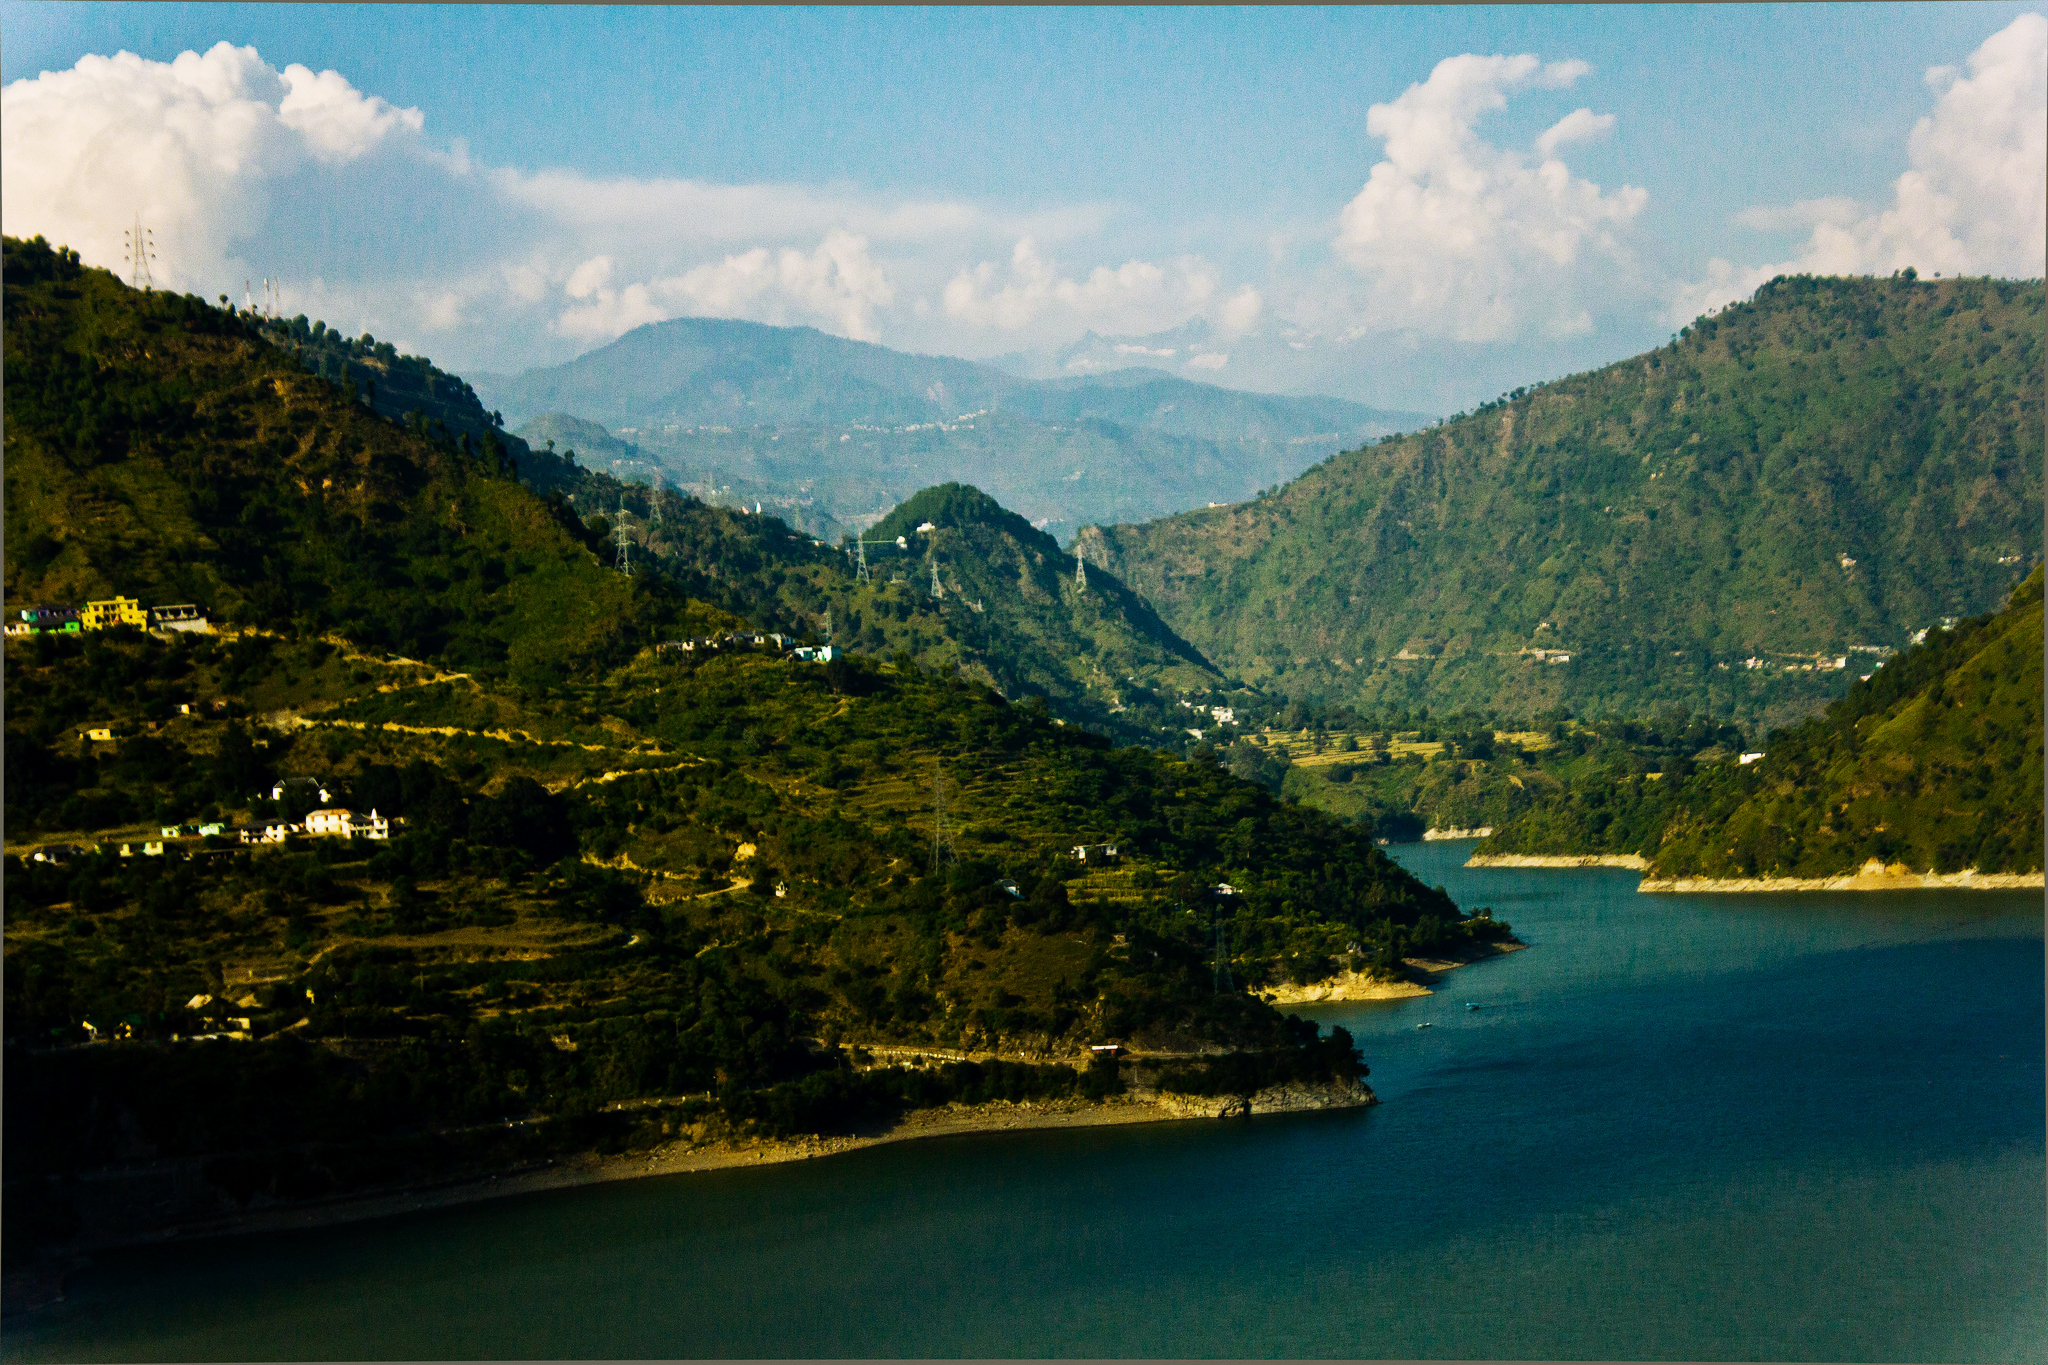 Dalhousie sightseeing : Chamera Lake